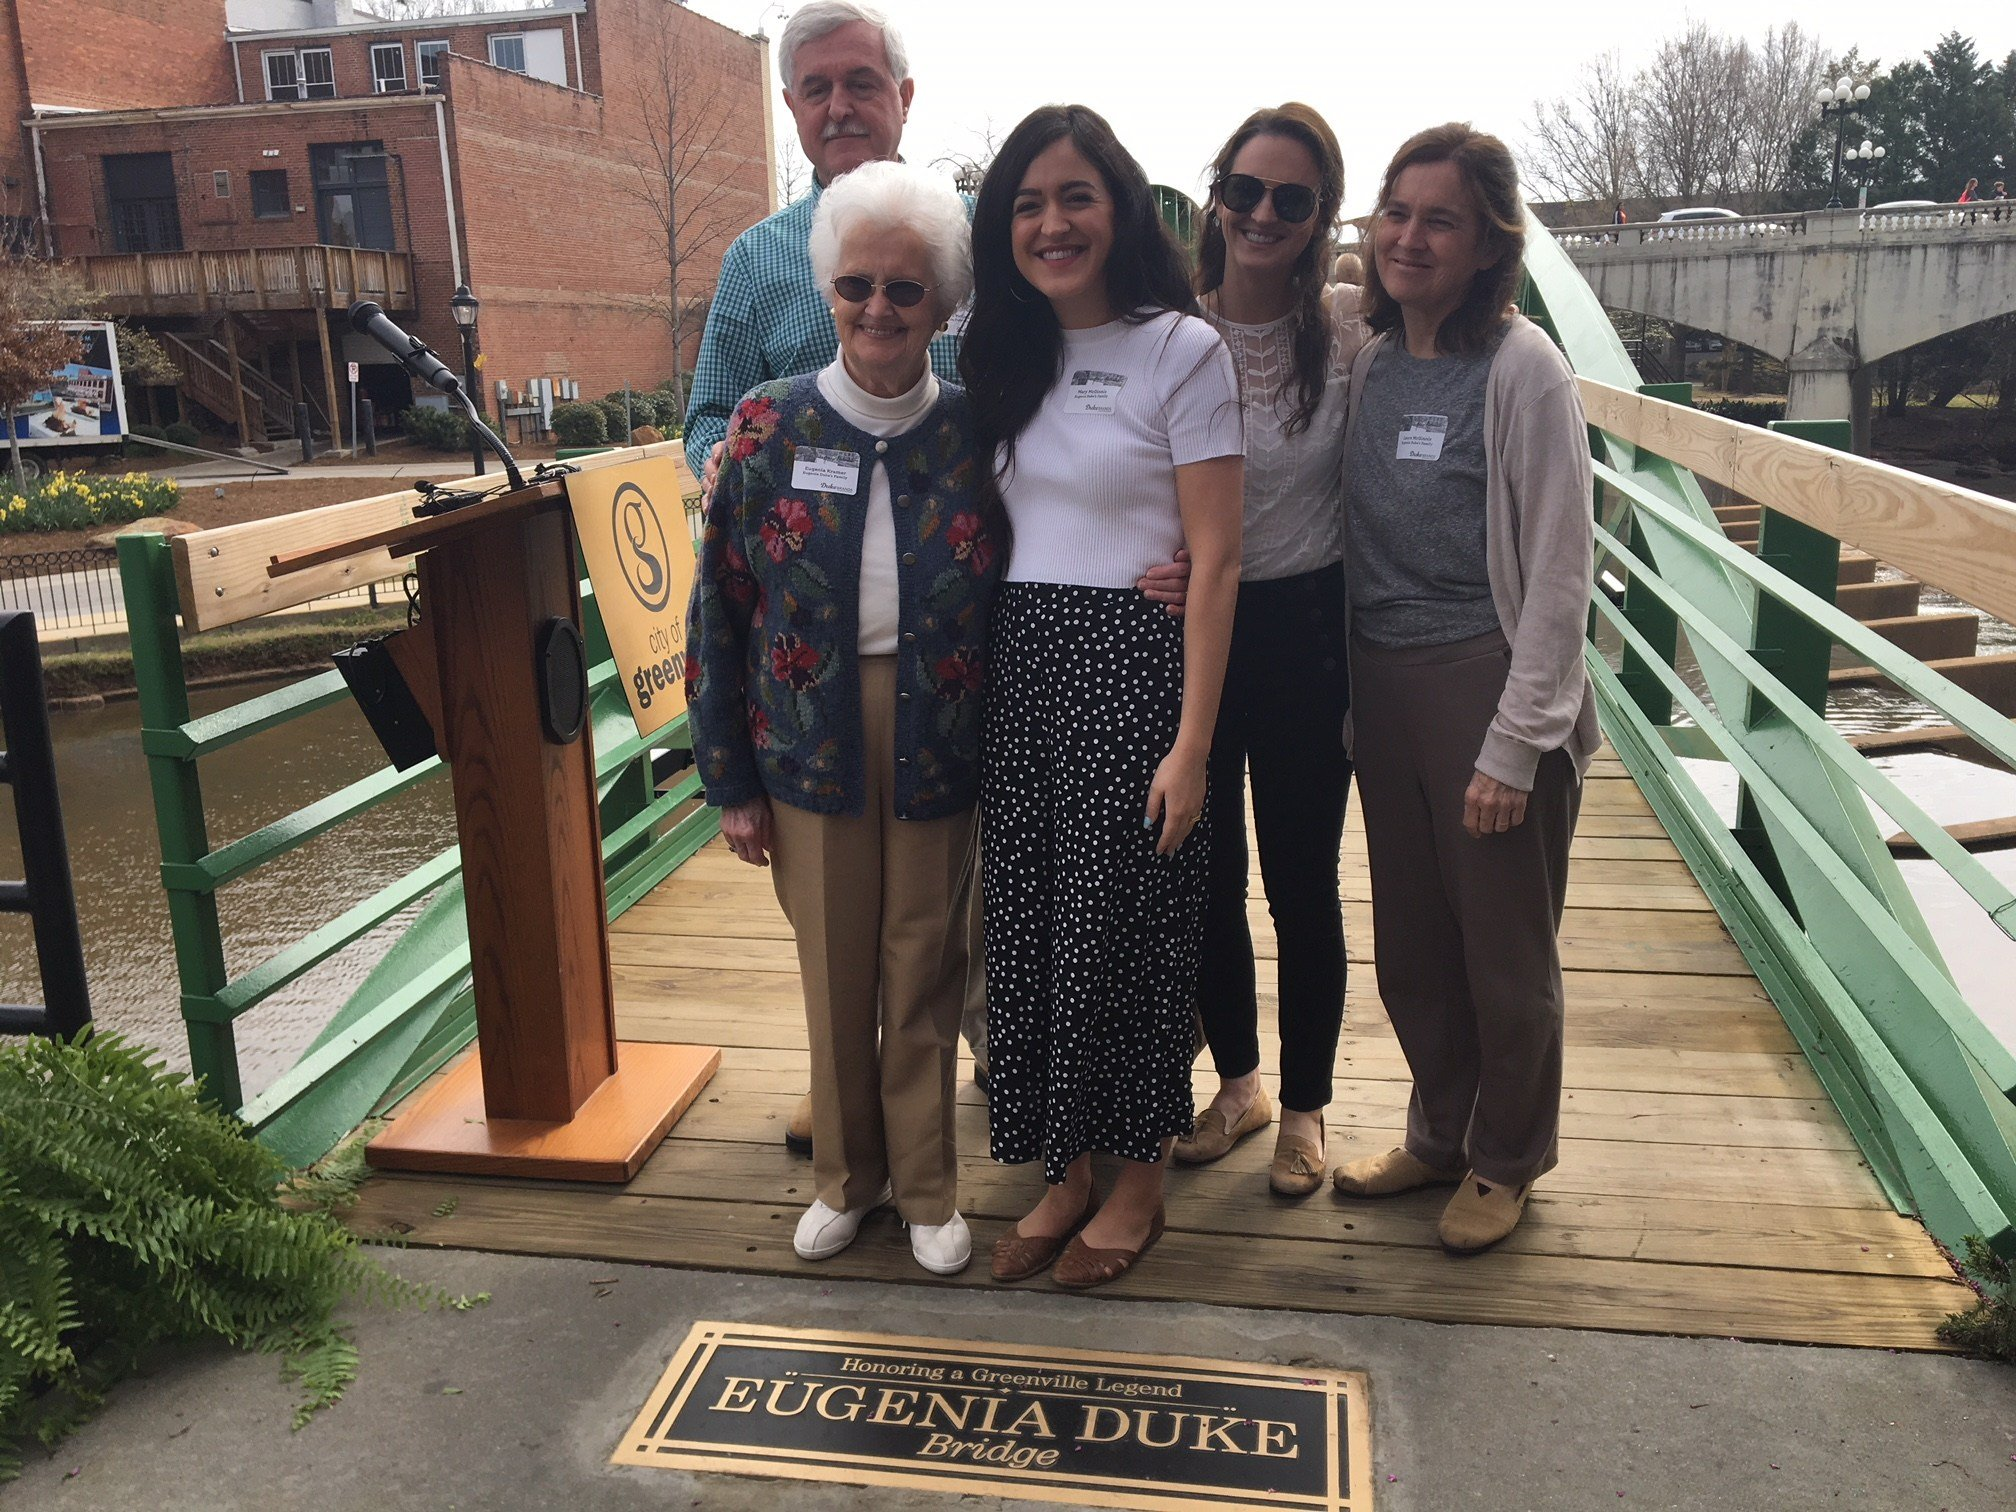 Family of Eugenia Duke attended a bridge dedication ceremony in downtown Greenville (FOX Carolina: 3/29/2018),